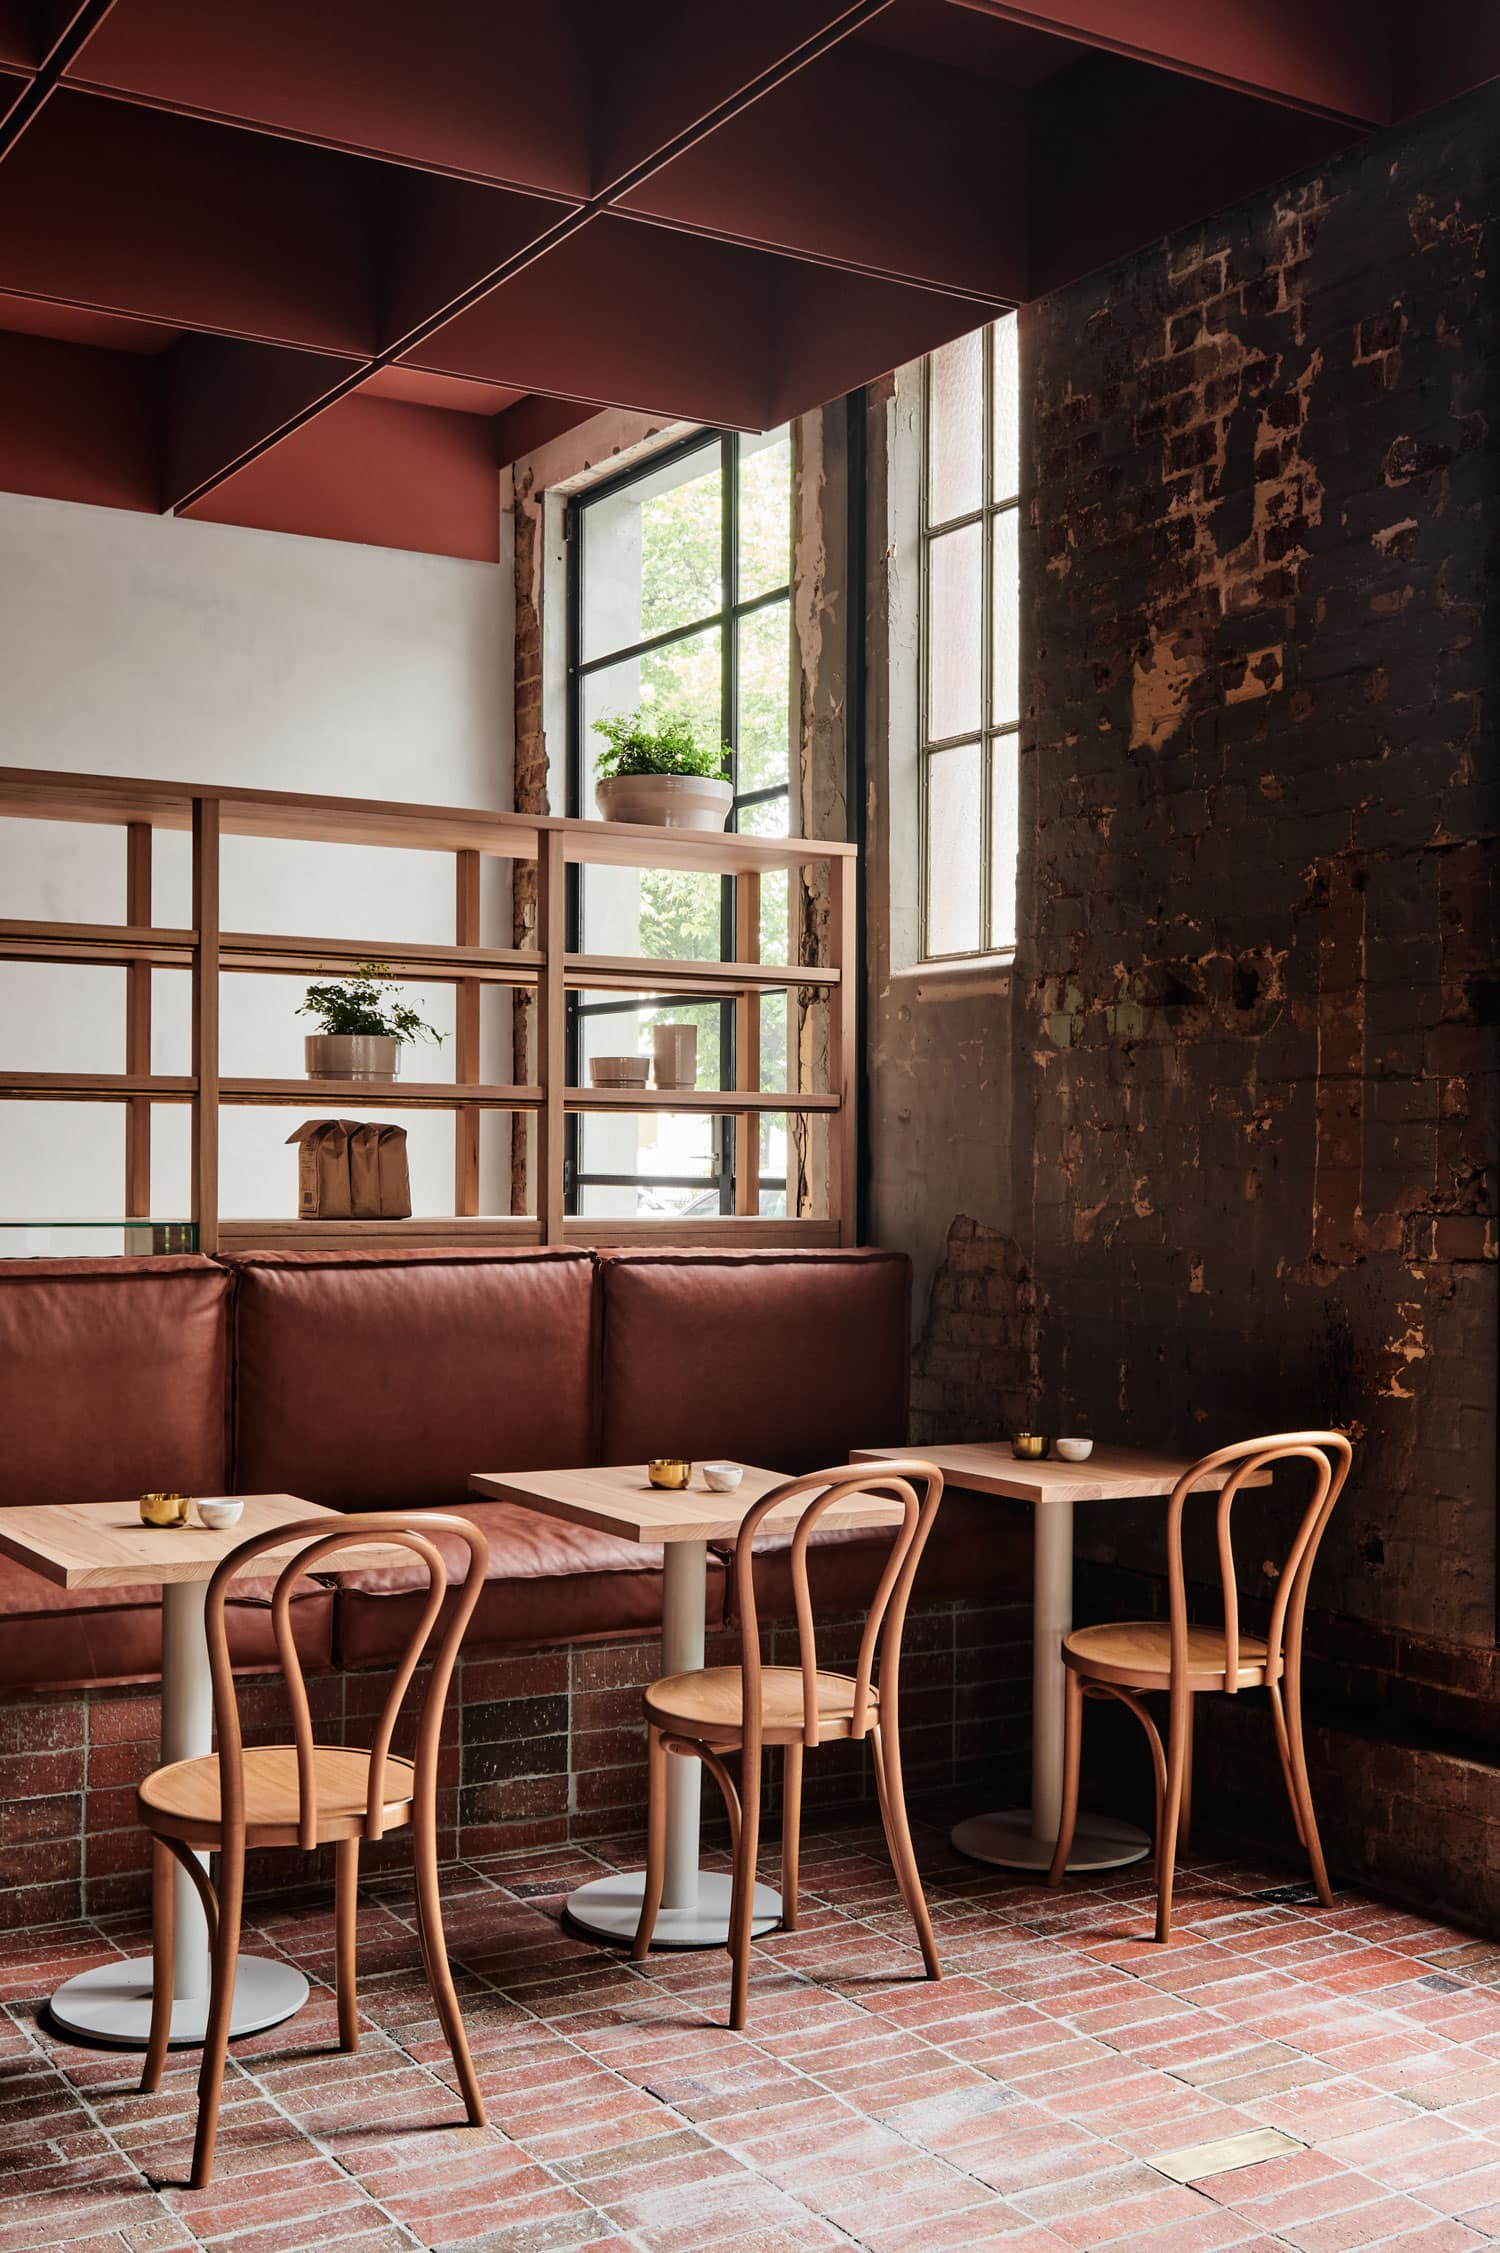 Harga Kursi Cafe Jati Belanda